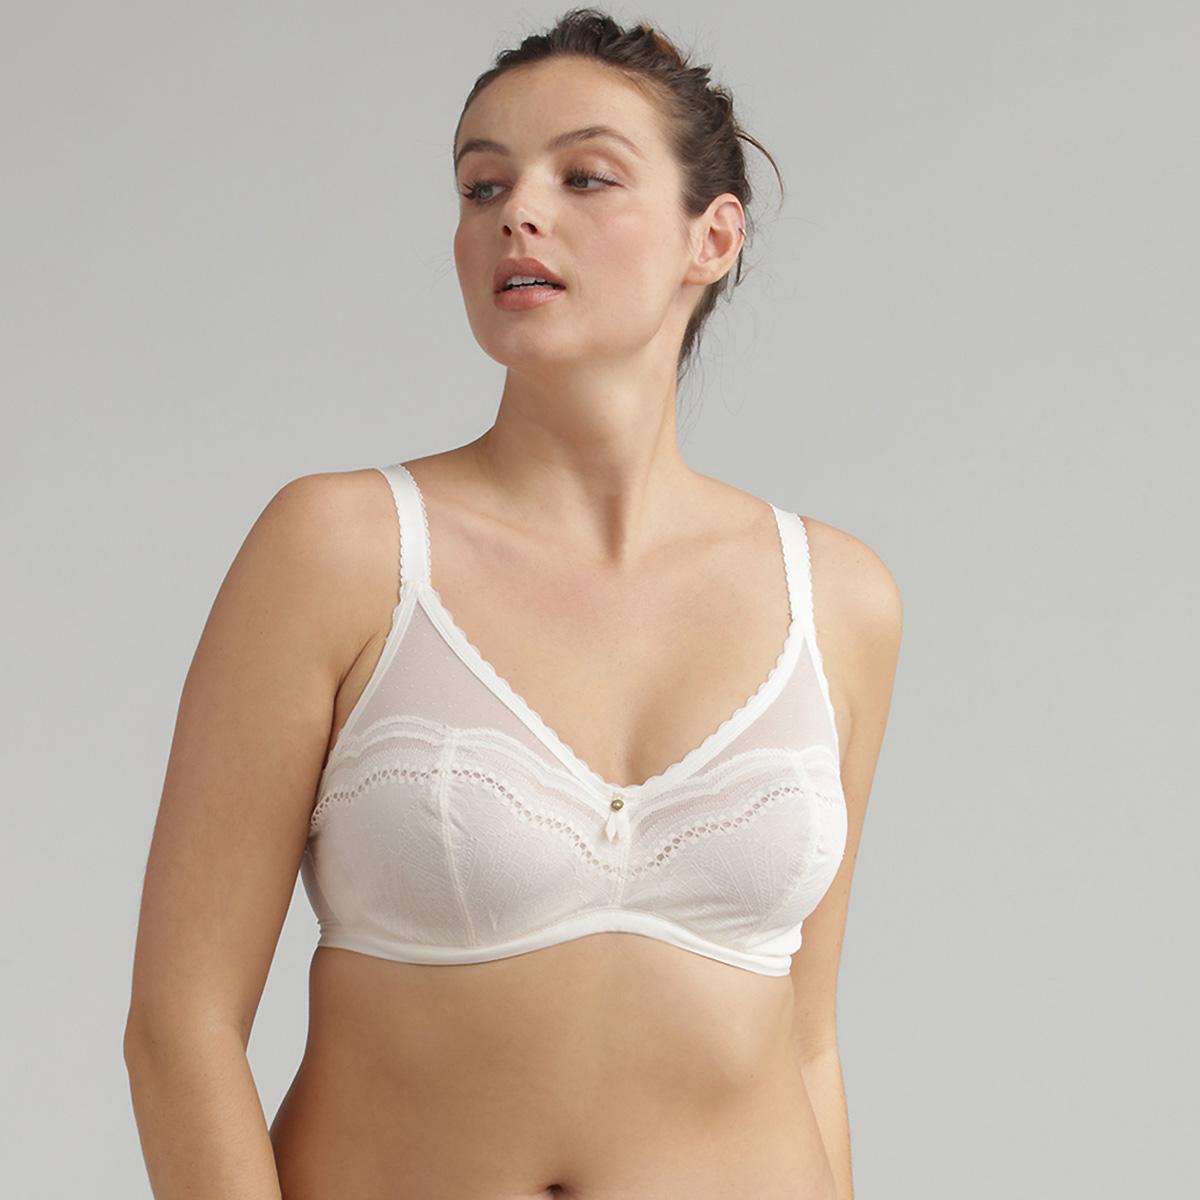 Underwired bra in ivory - Secret Comfort , , PLAYTEX